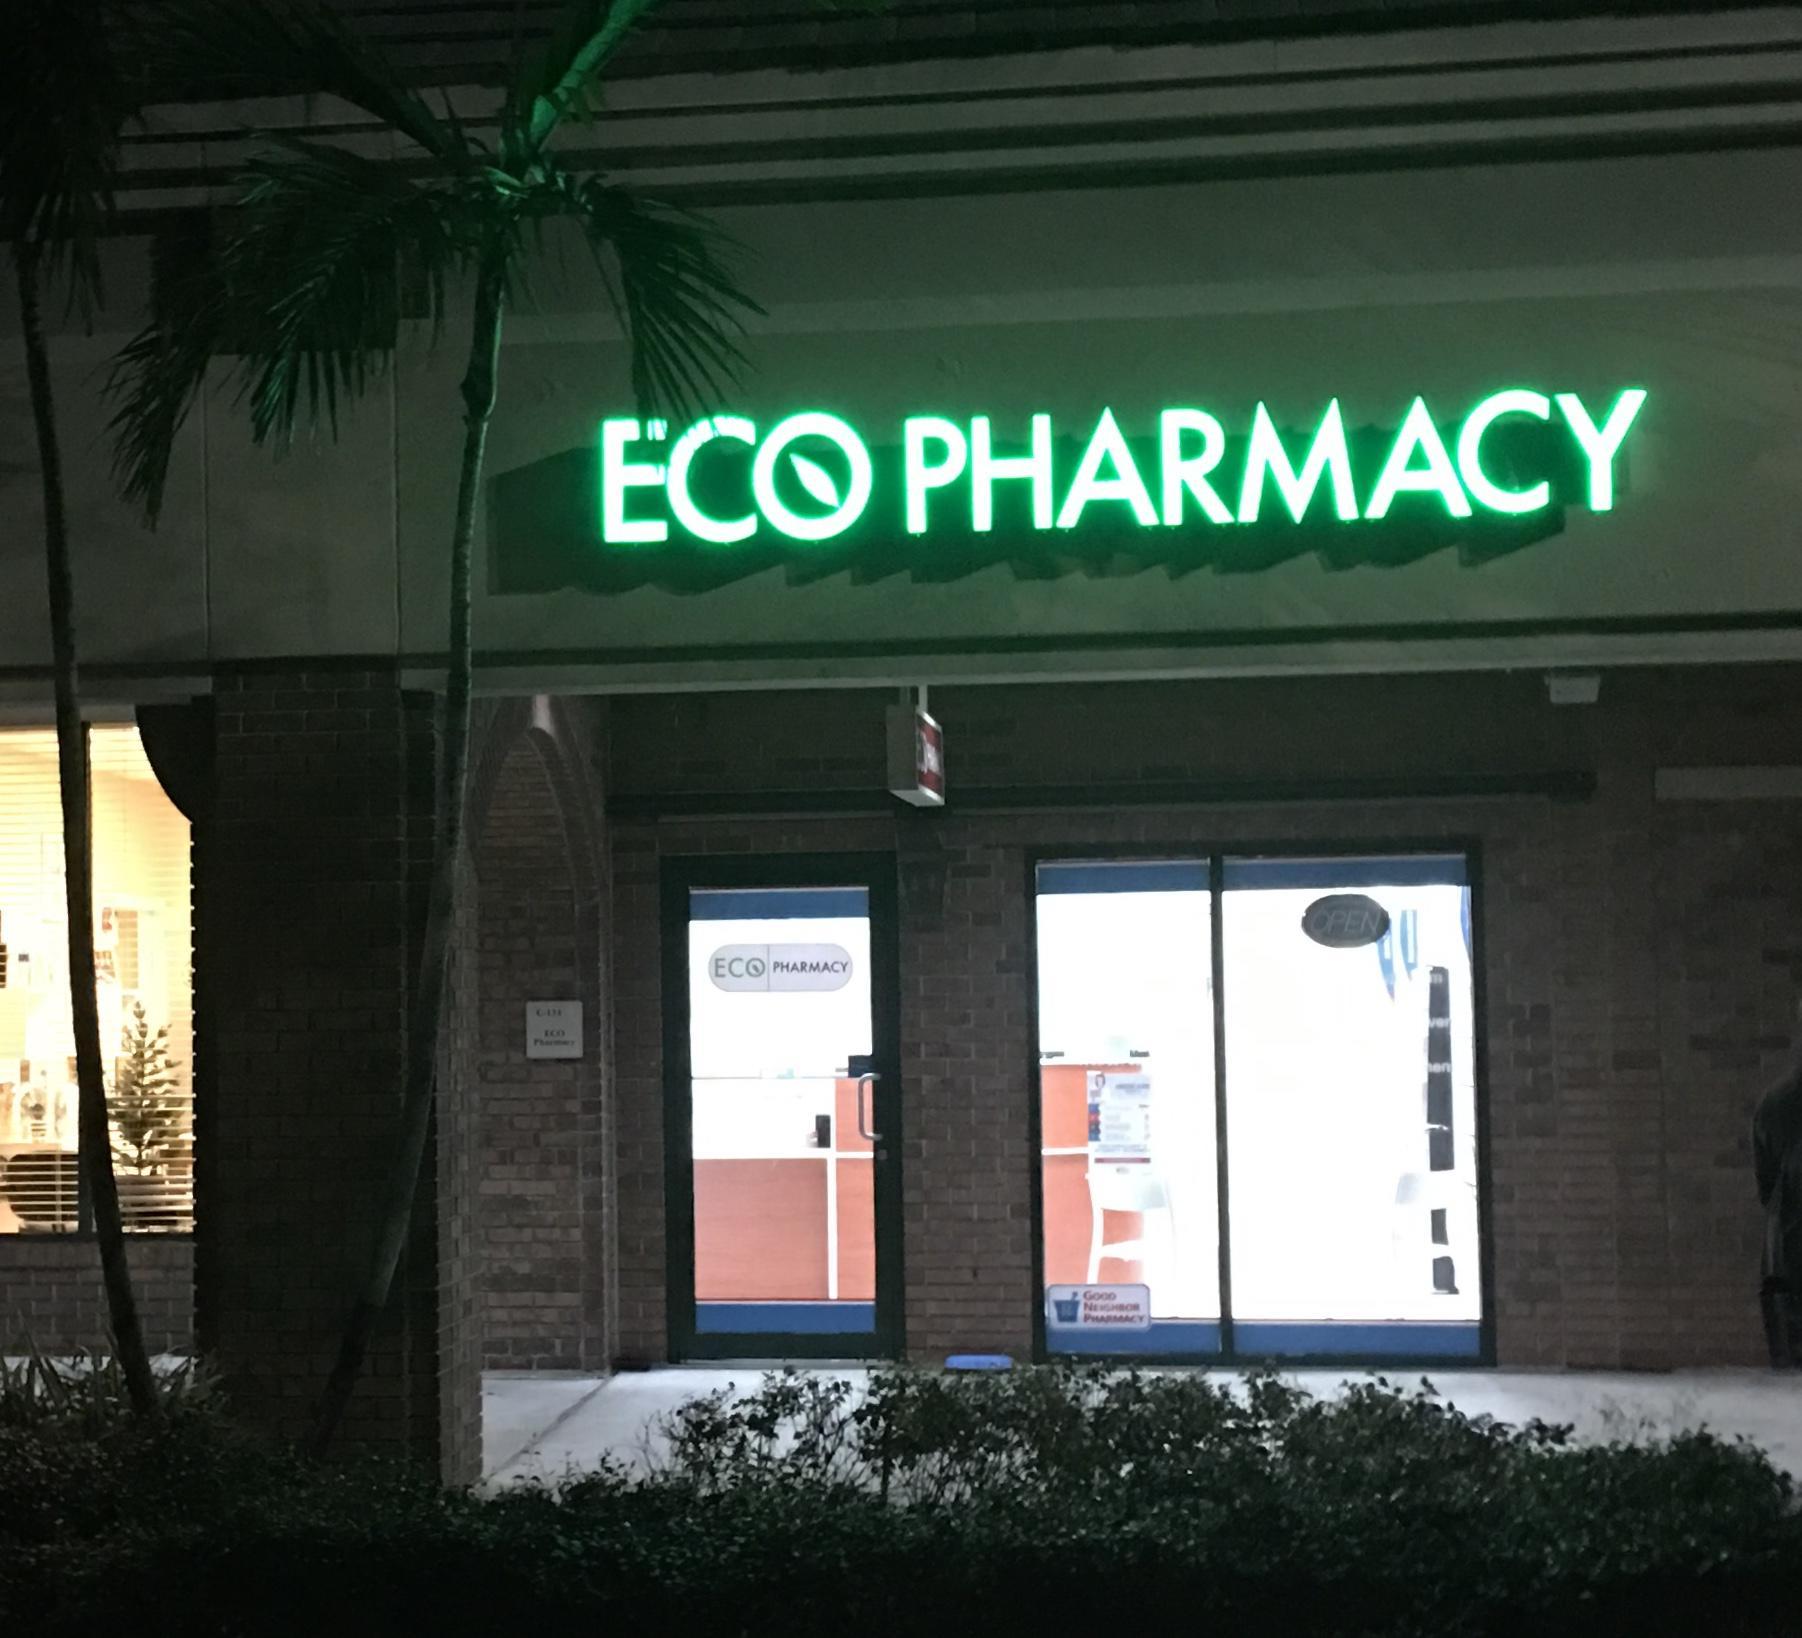 Eco Pharmacy image 5